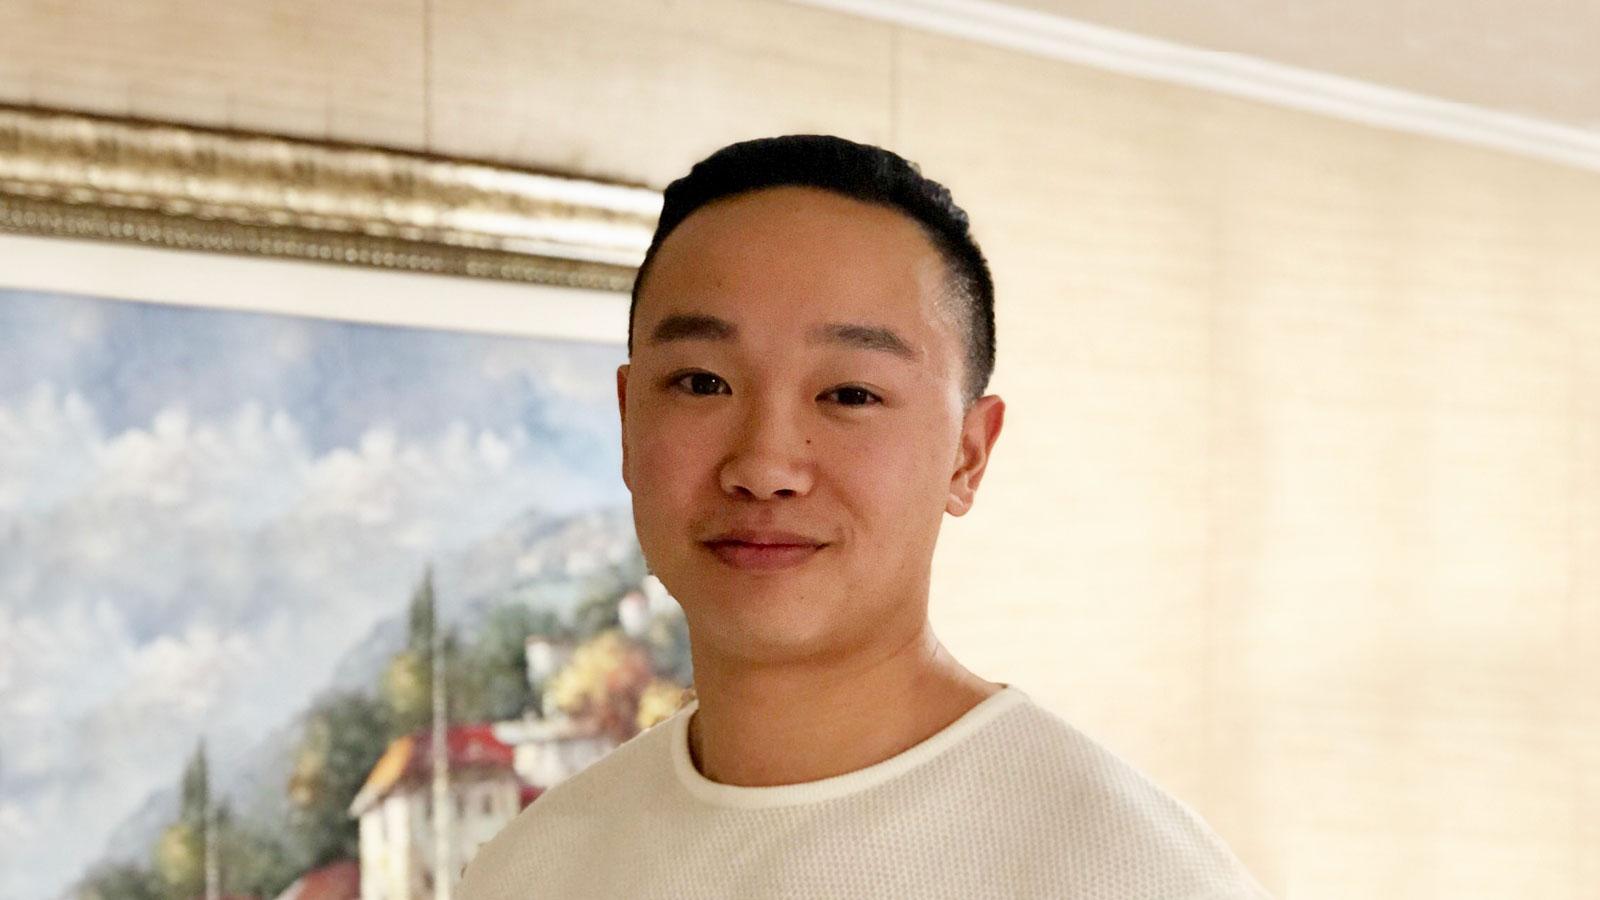 MetaMask Community Lead Jason Lee: Don't risk your community for quick cash gains